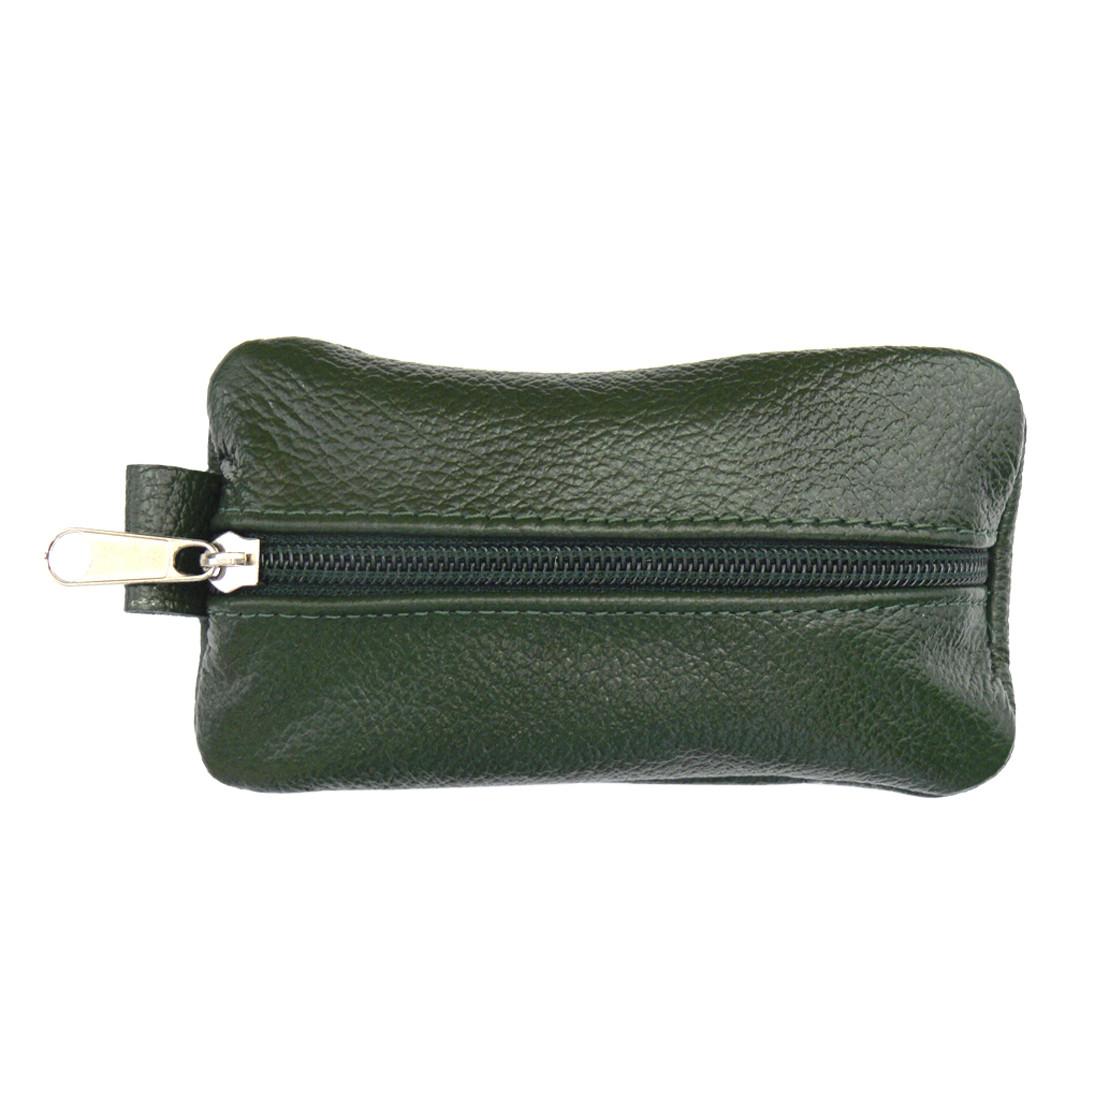 Ключница BagHouse плоская, зелёная из натуральной кожи 13х7,5 см клп13 зел